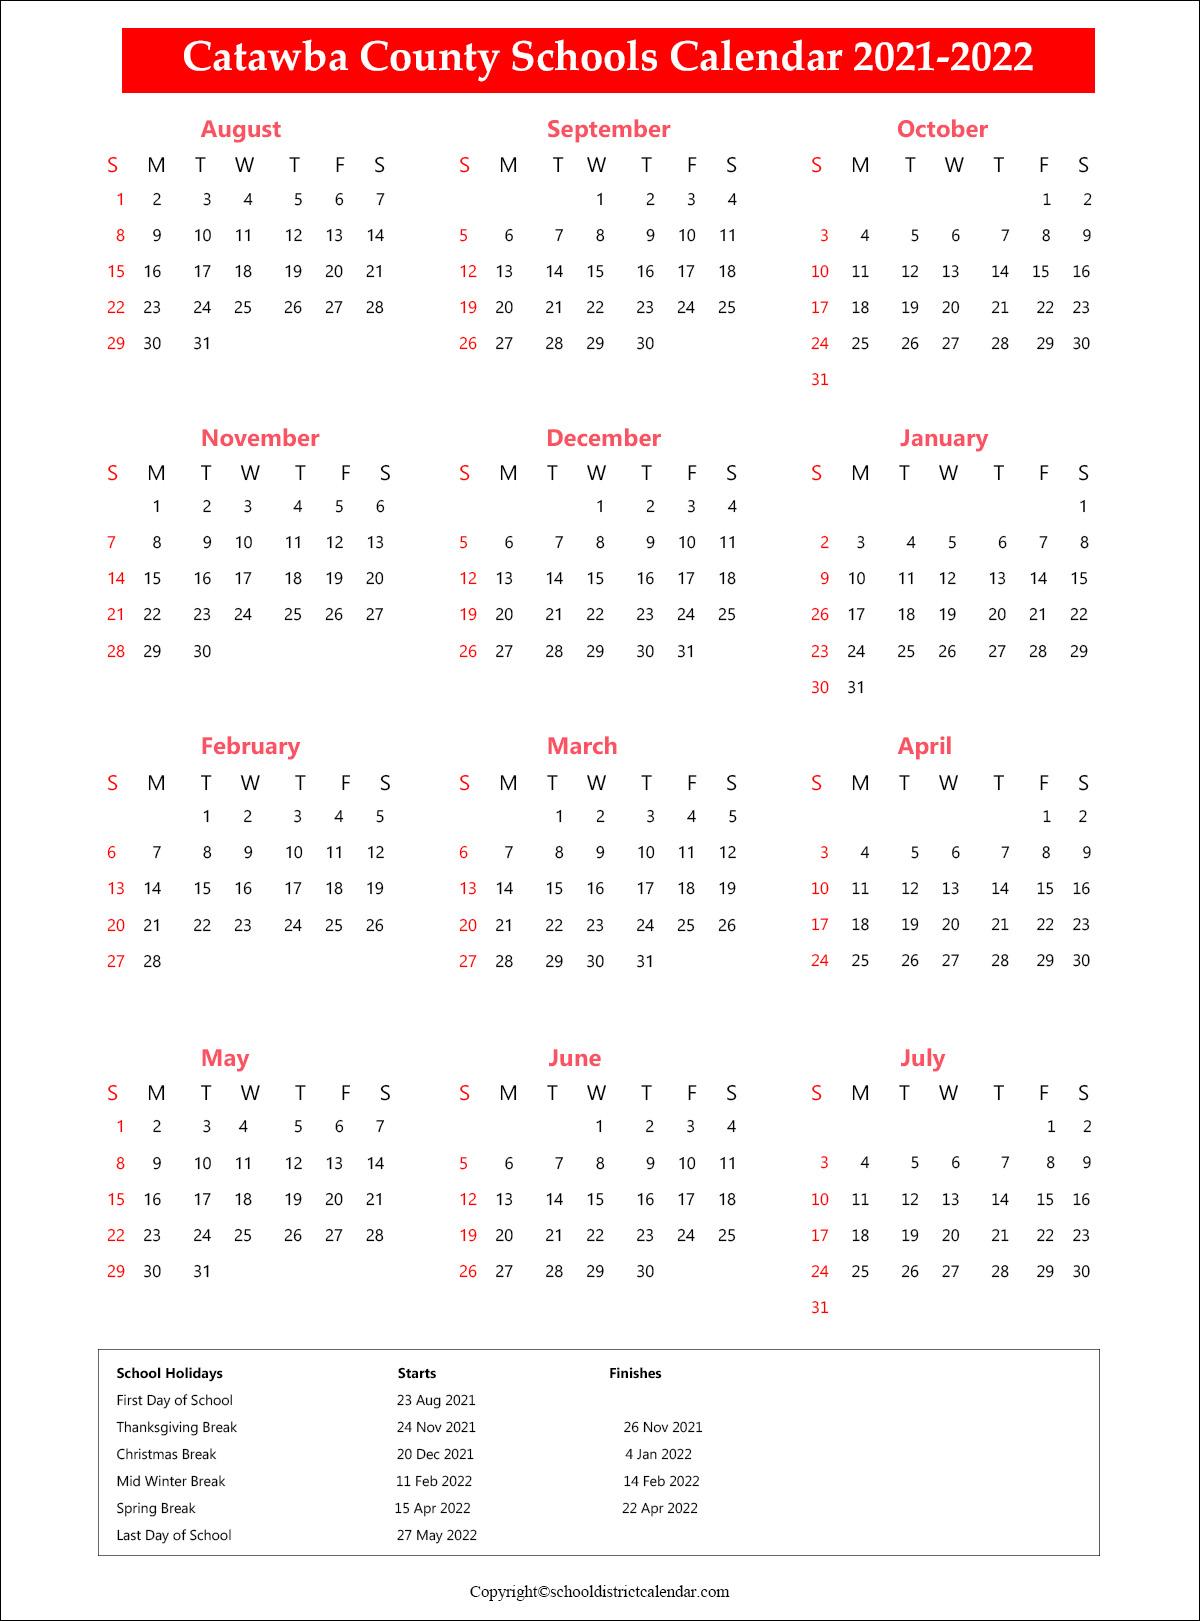 Catawba County Schools District Calendar 2021